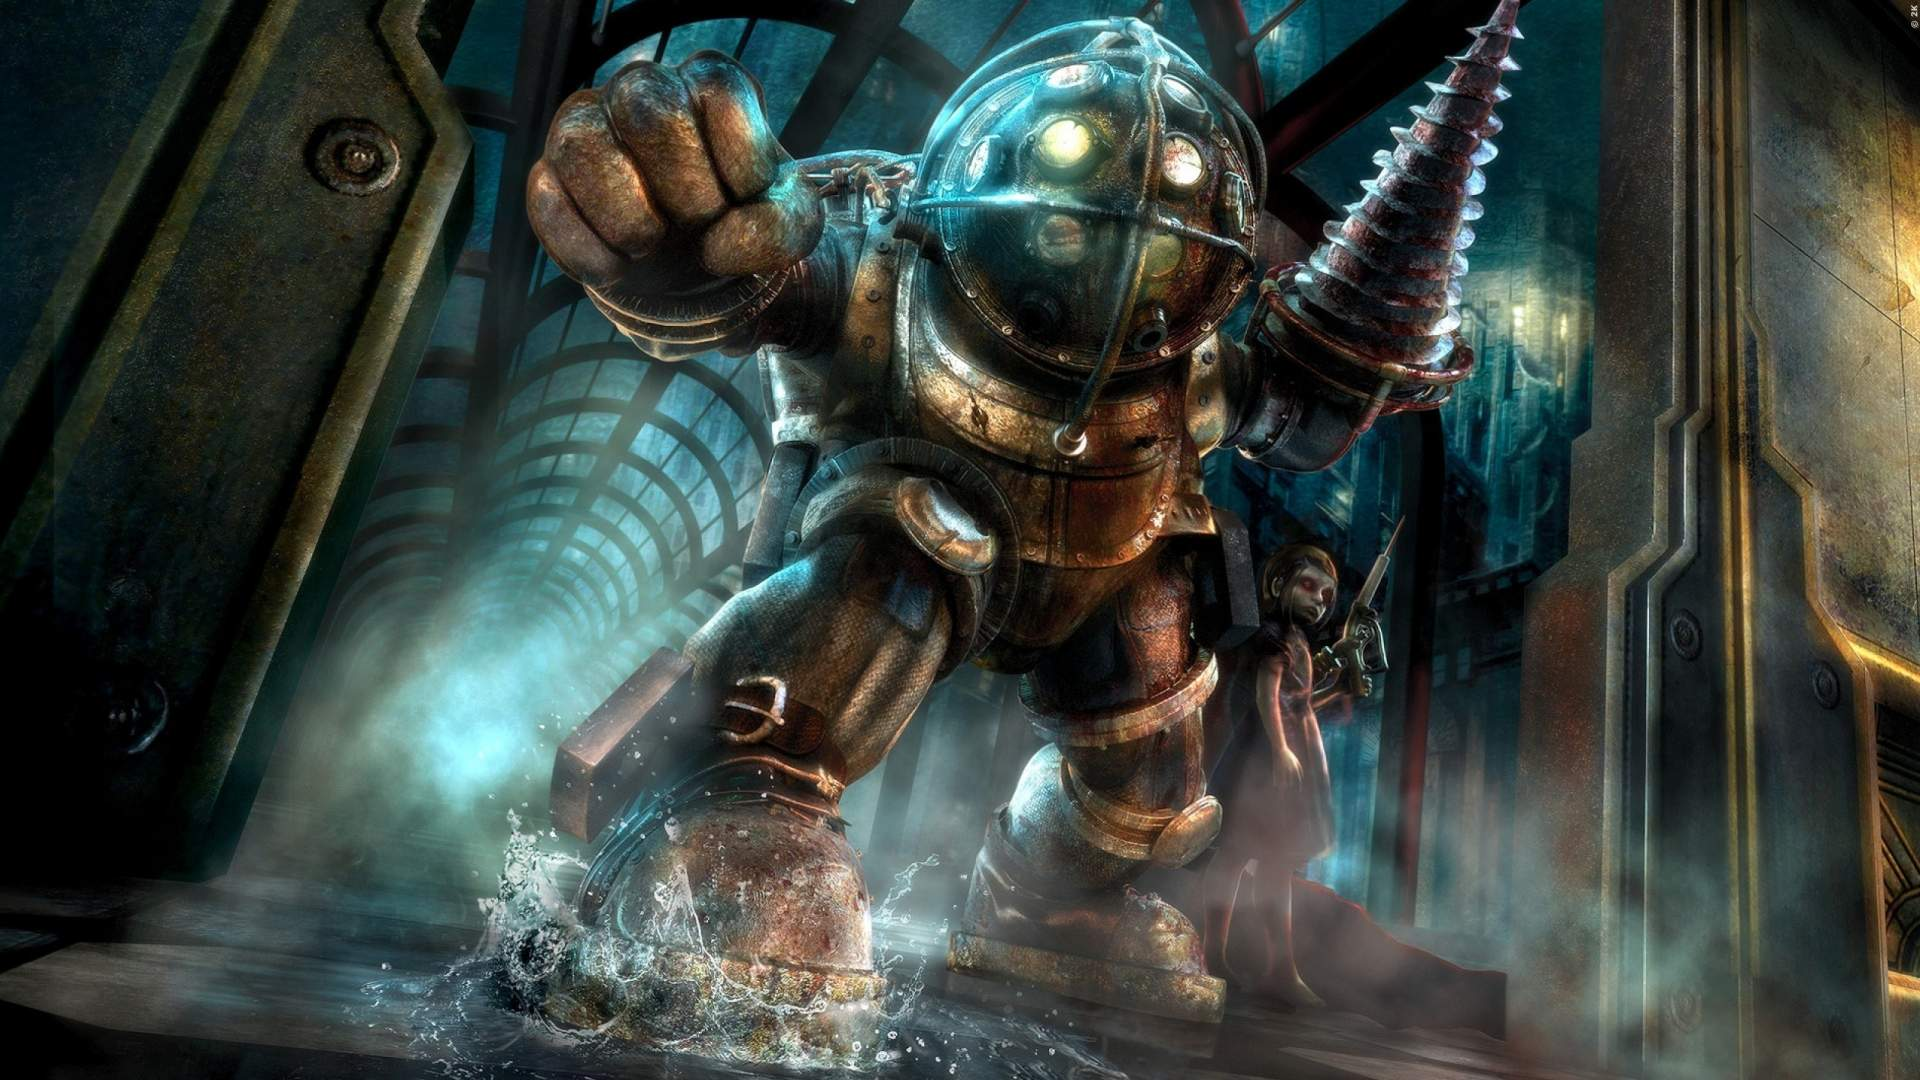 GAME-VERFILMUNG: 'BioShock' Kinofilm vom 'Mortal Kombat'-Macher geplant